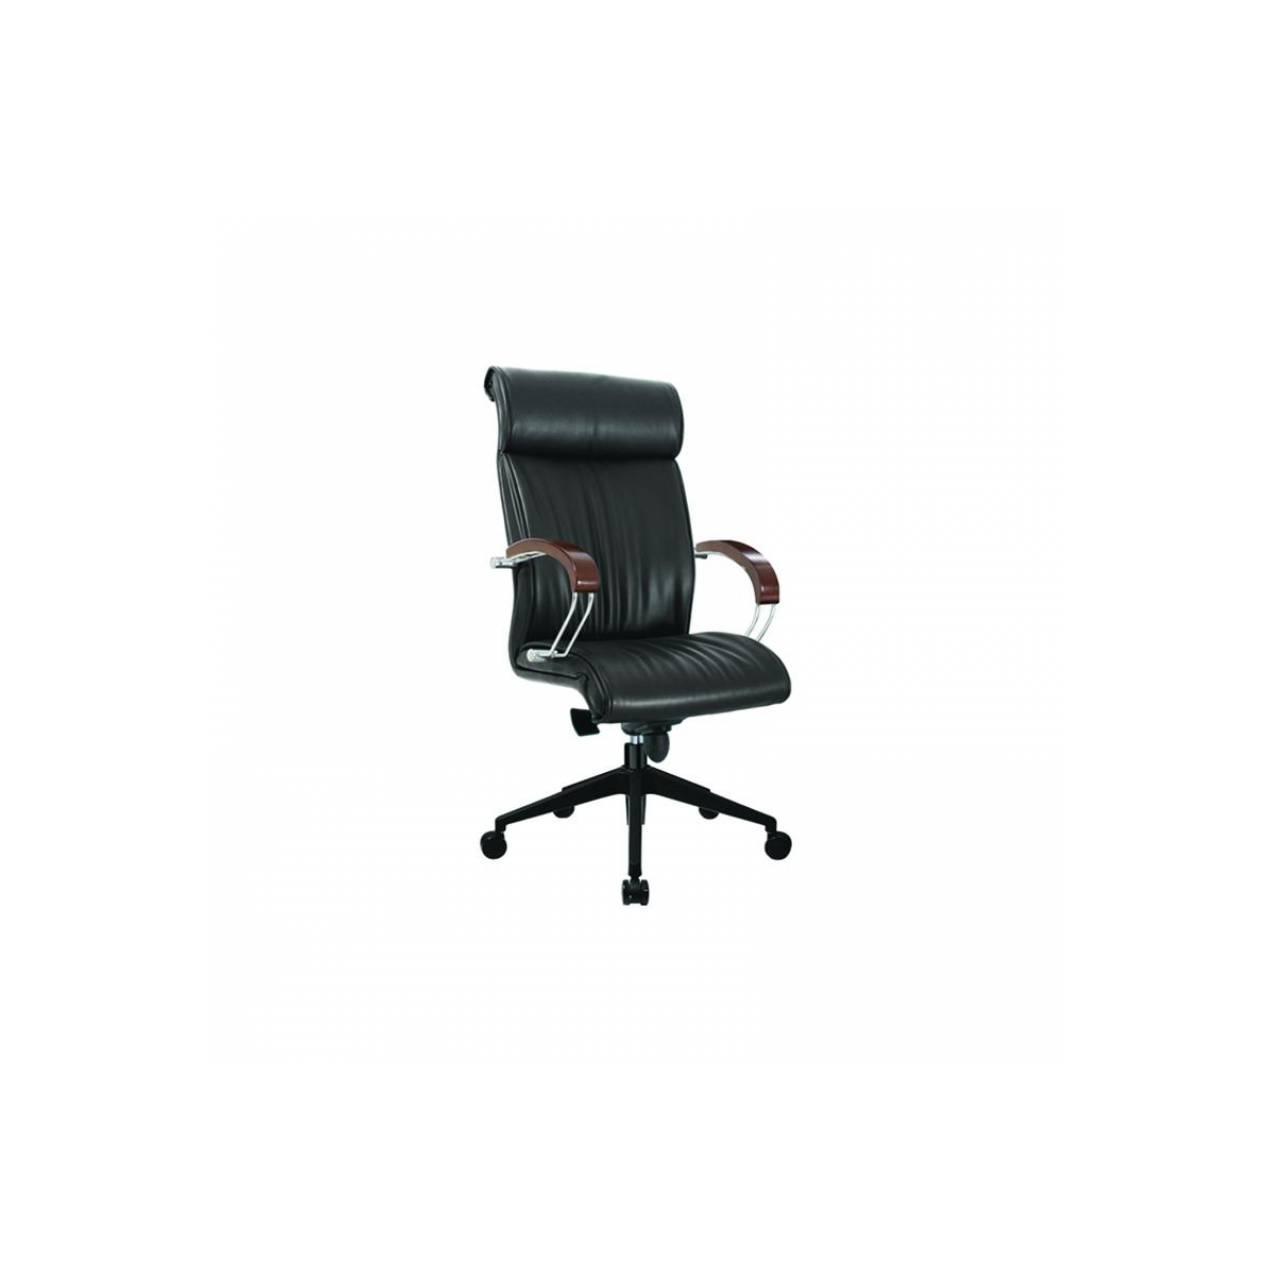 kursi kantor direktur indachi elegan dan nyaman tangan kayu